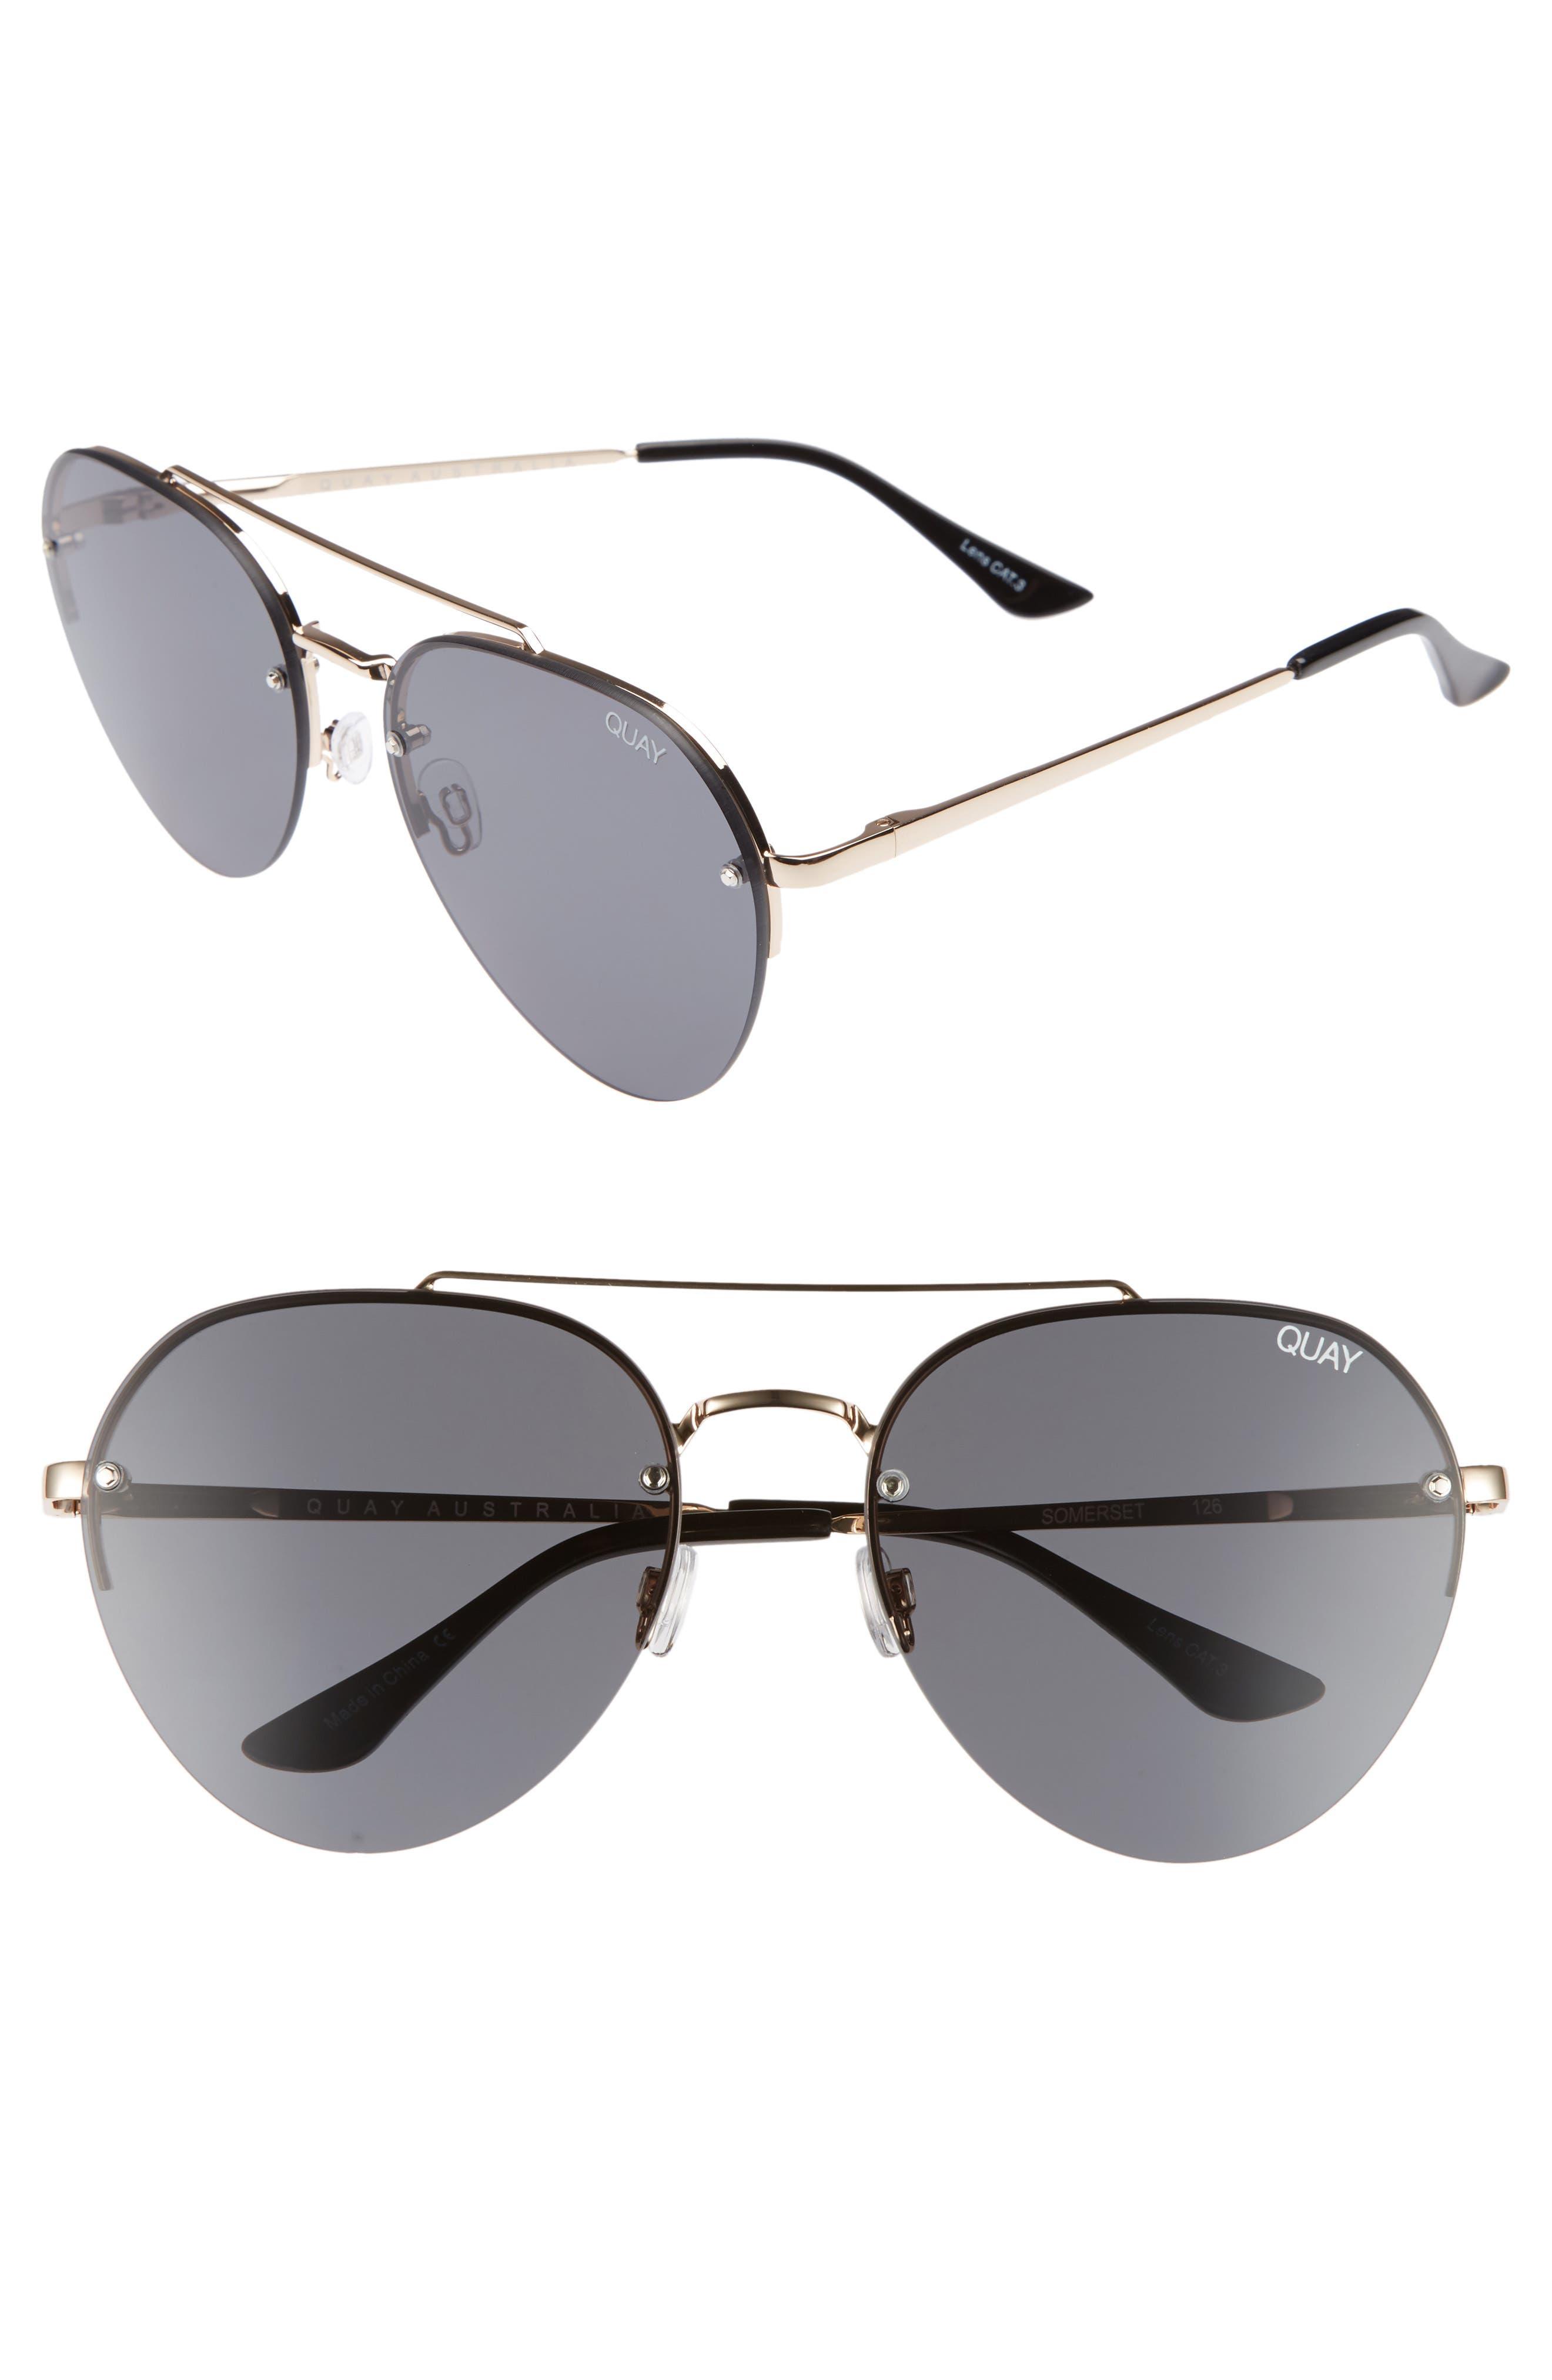 Somerset 65mm Aviator Sunglasses,                             Main thumbnail 1, color,                             GOLD/ SMOKE